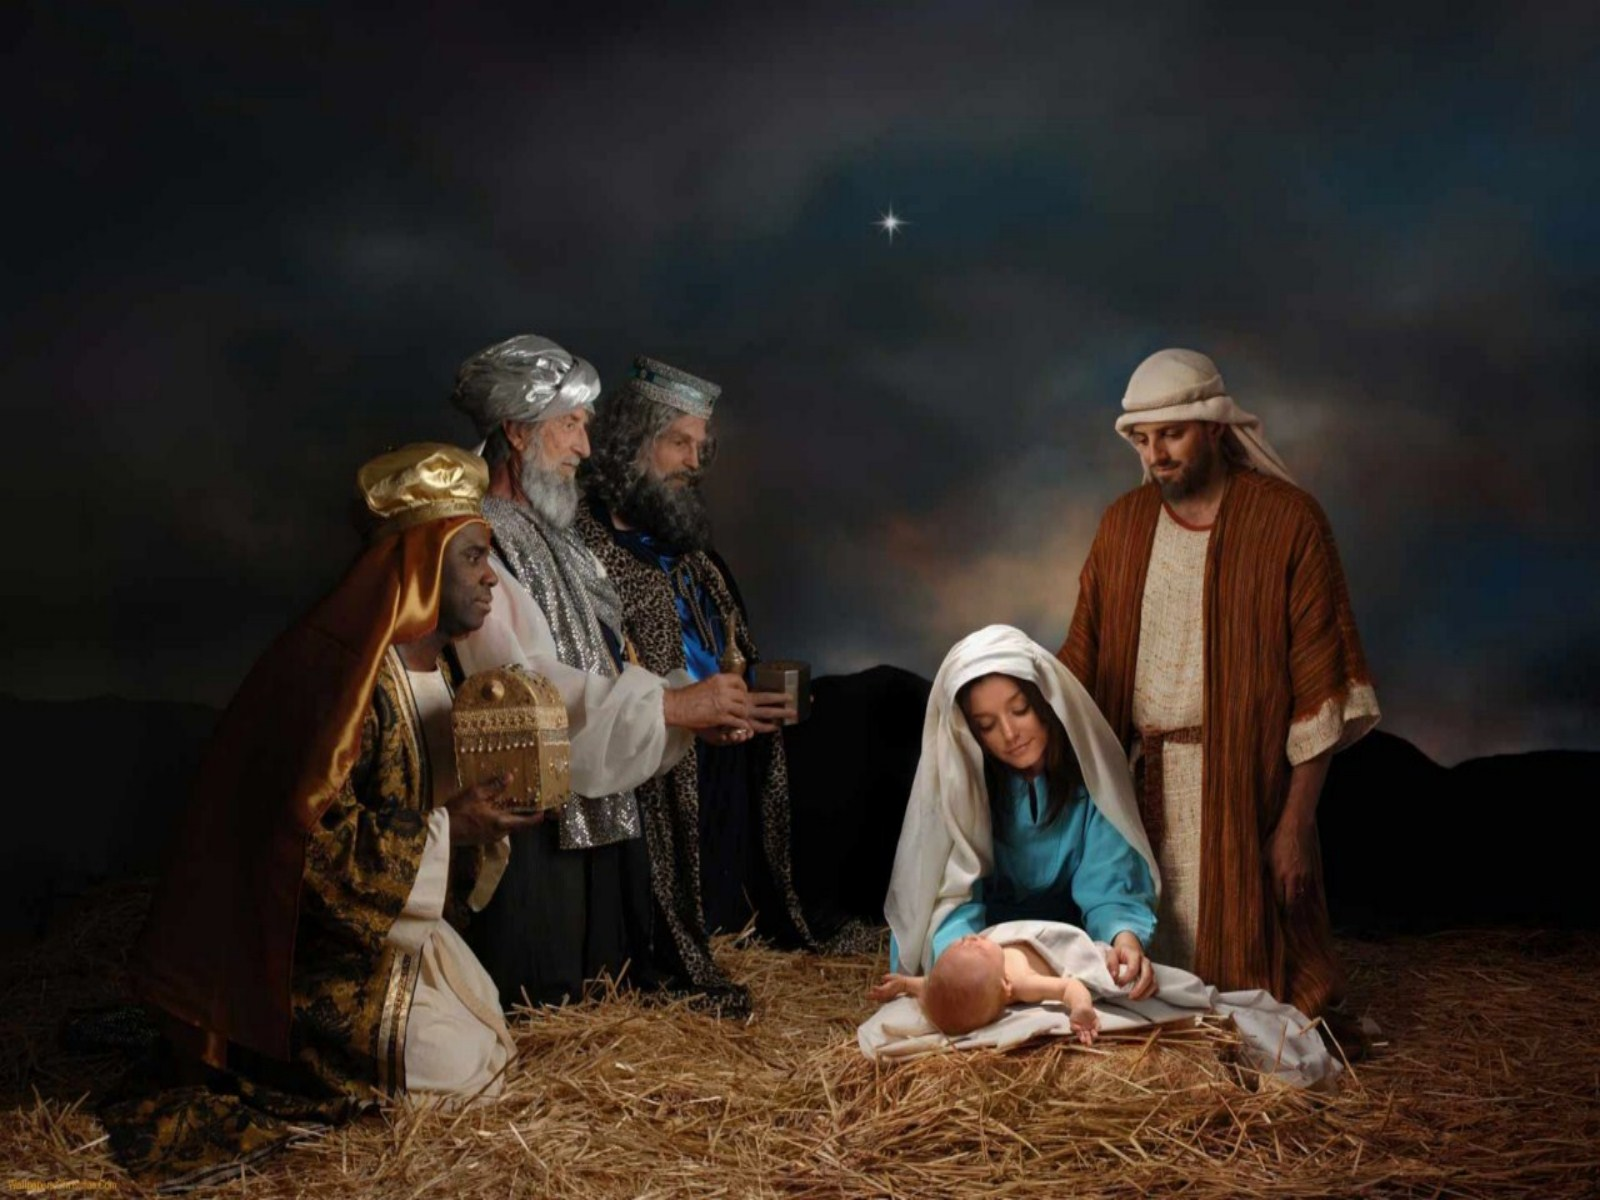 christmas nativity backgrounds wallpaper  jpeg otherjpg 1600x1200